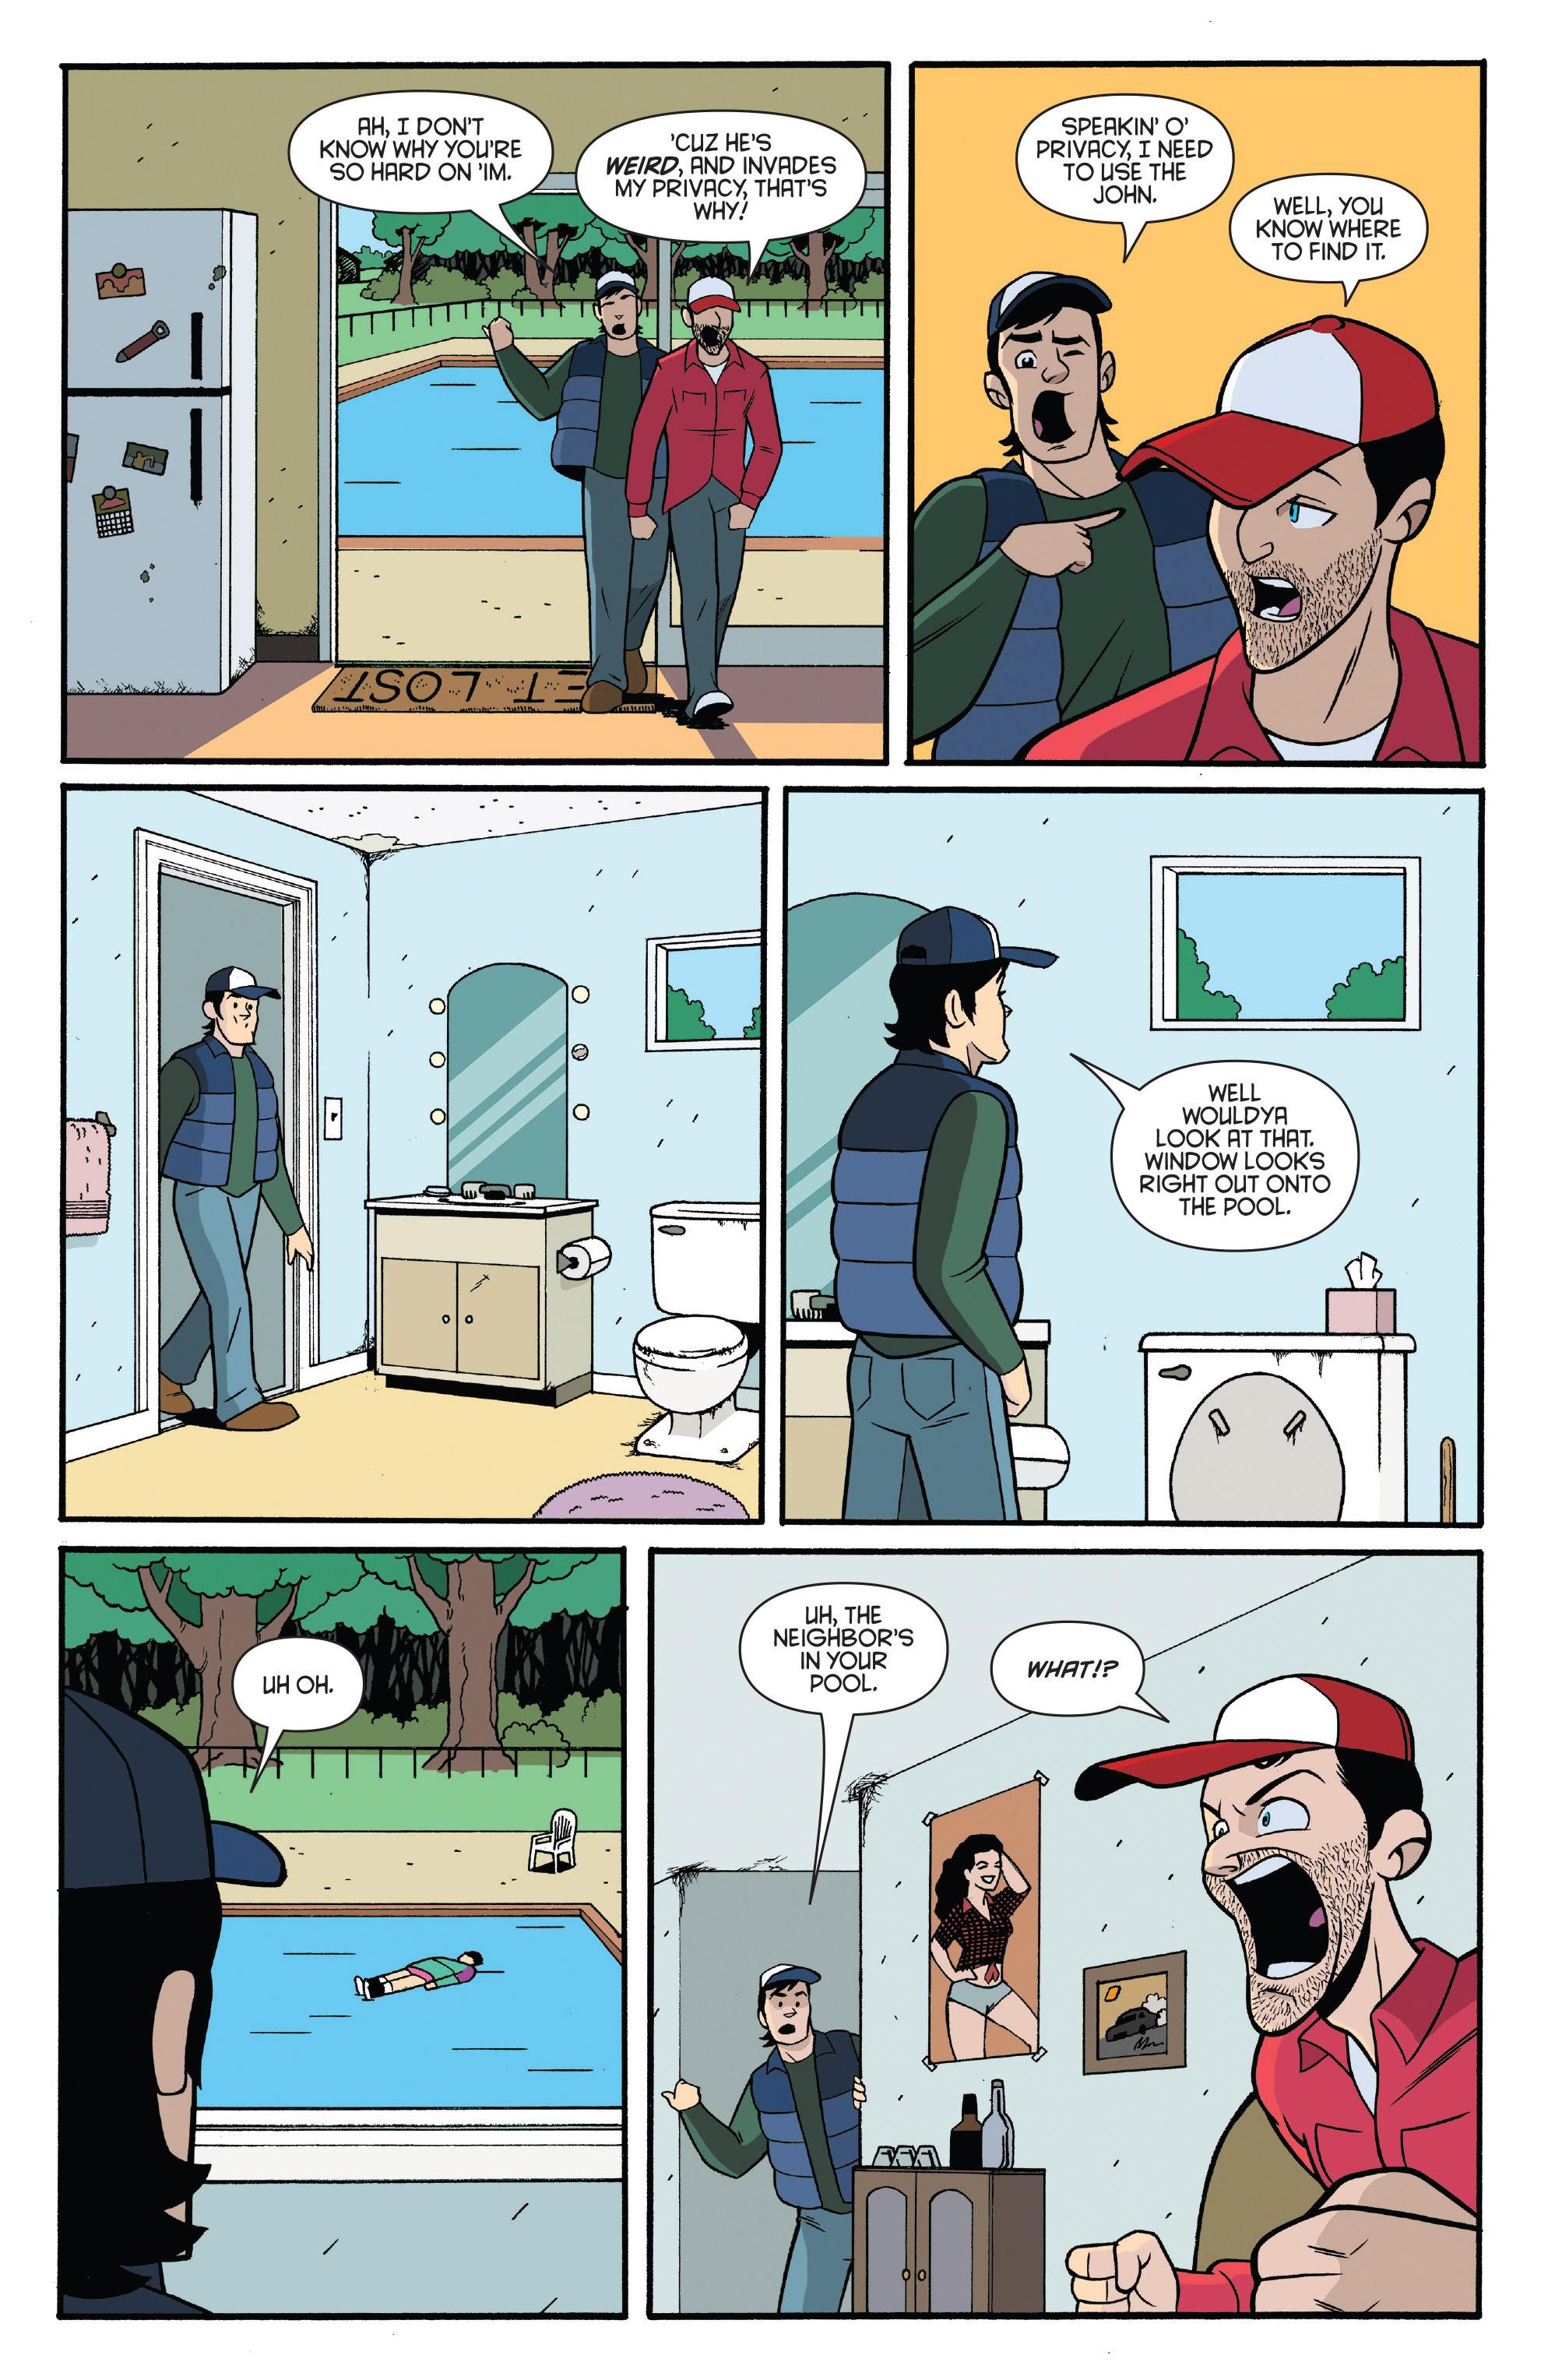 Read online Smosh comic -  Issue #2 - 25